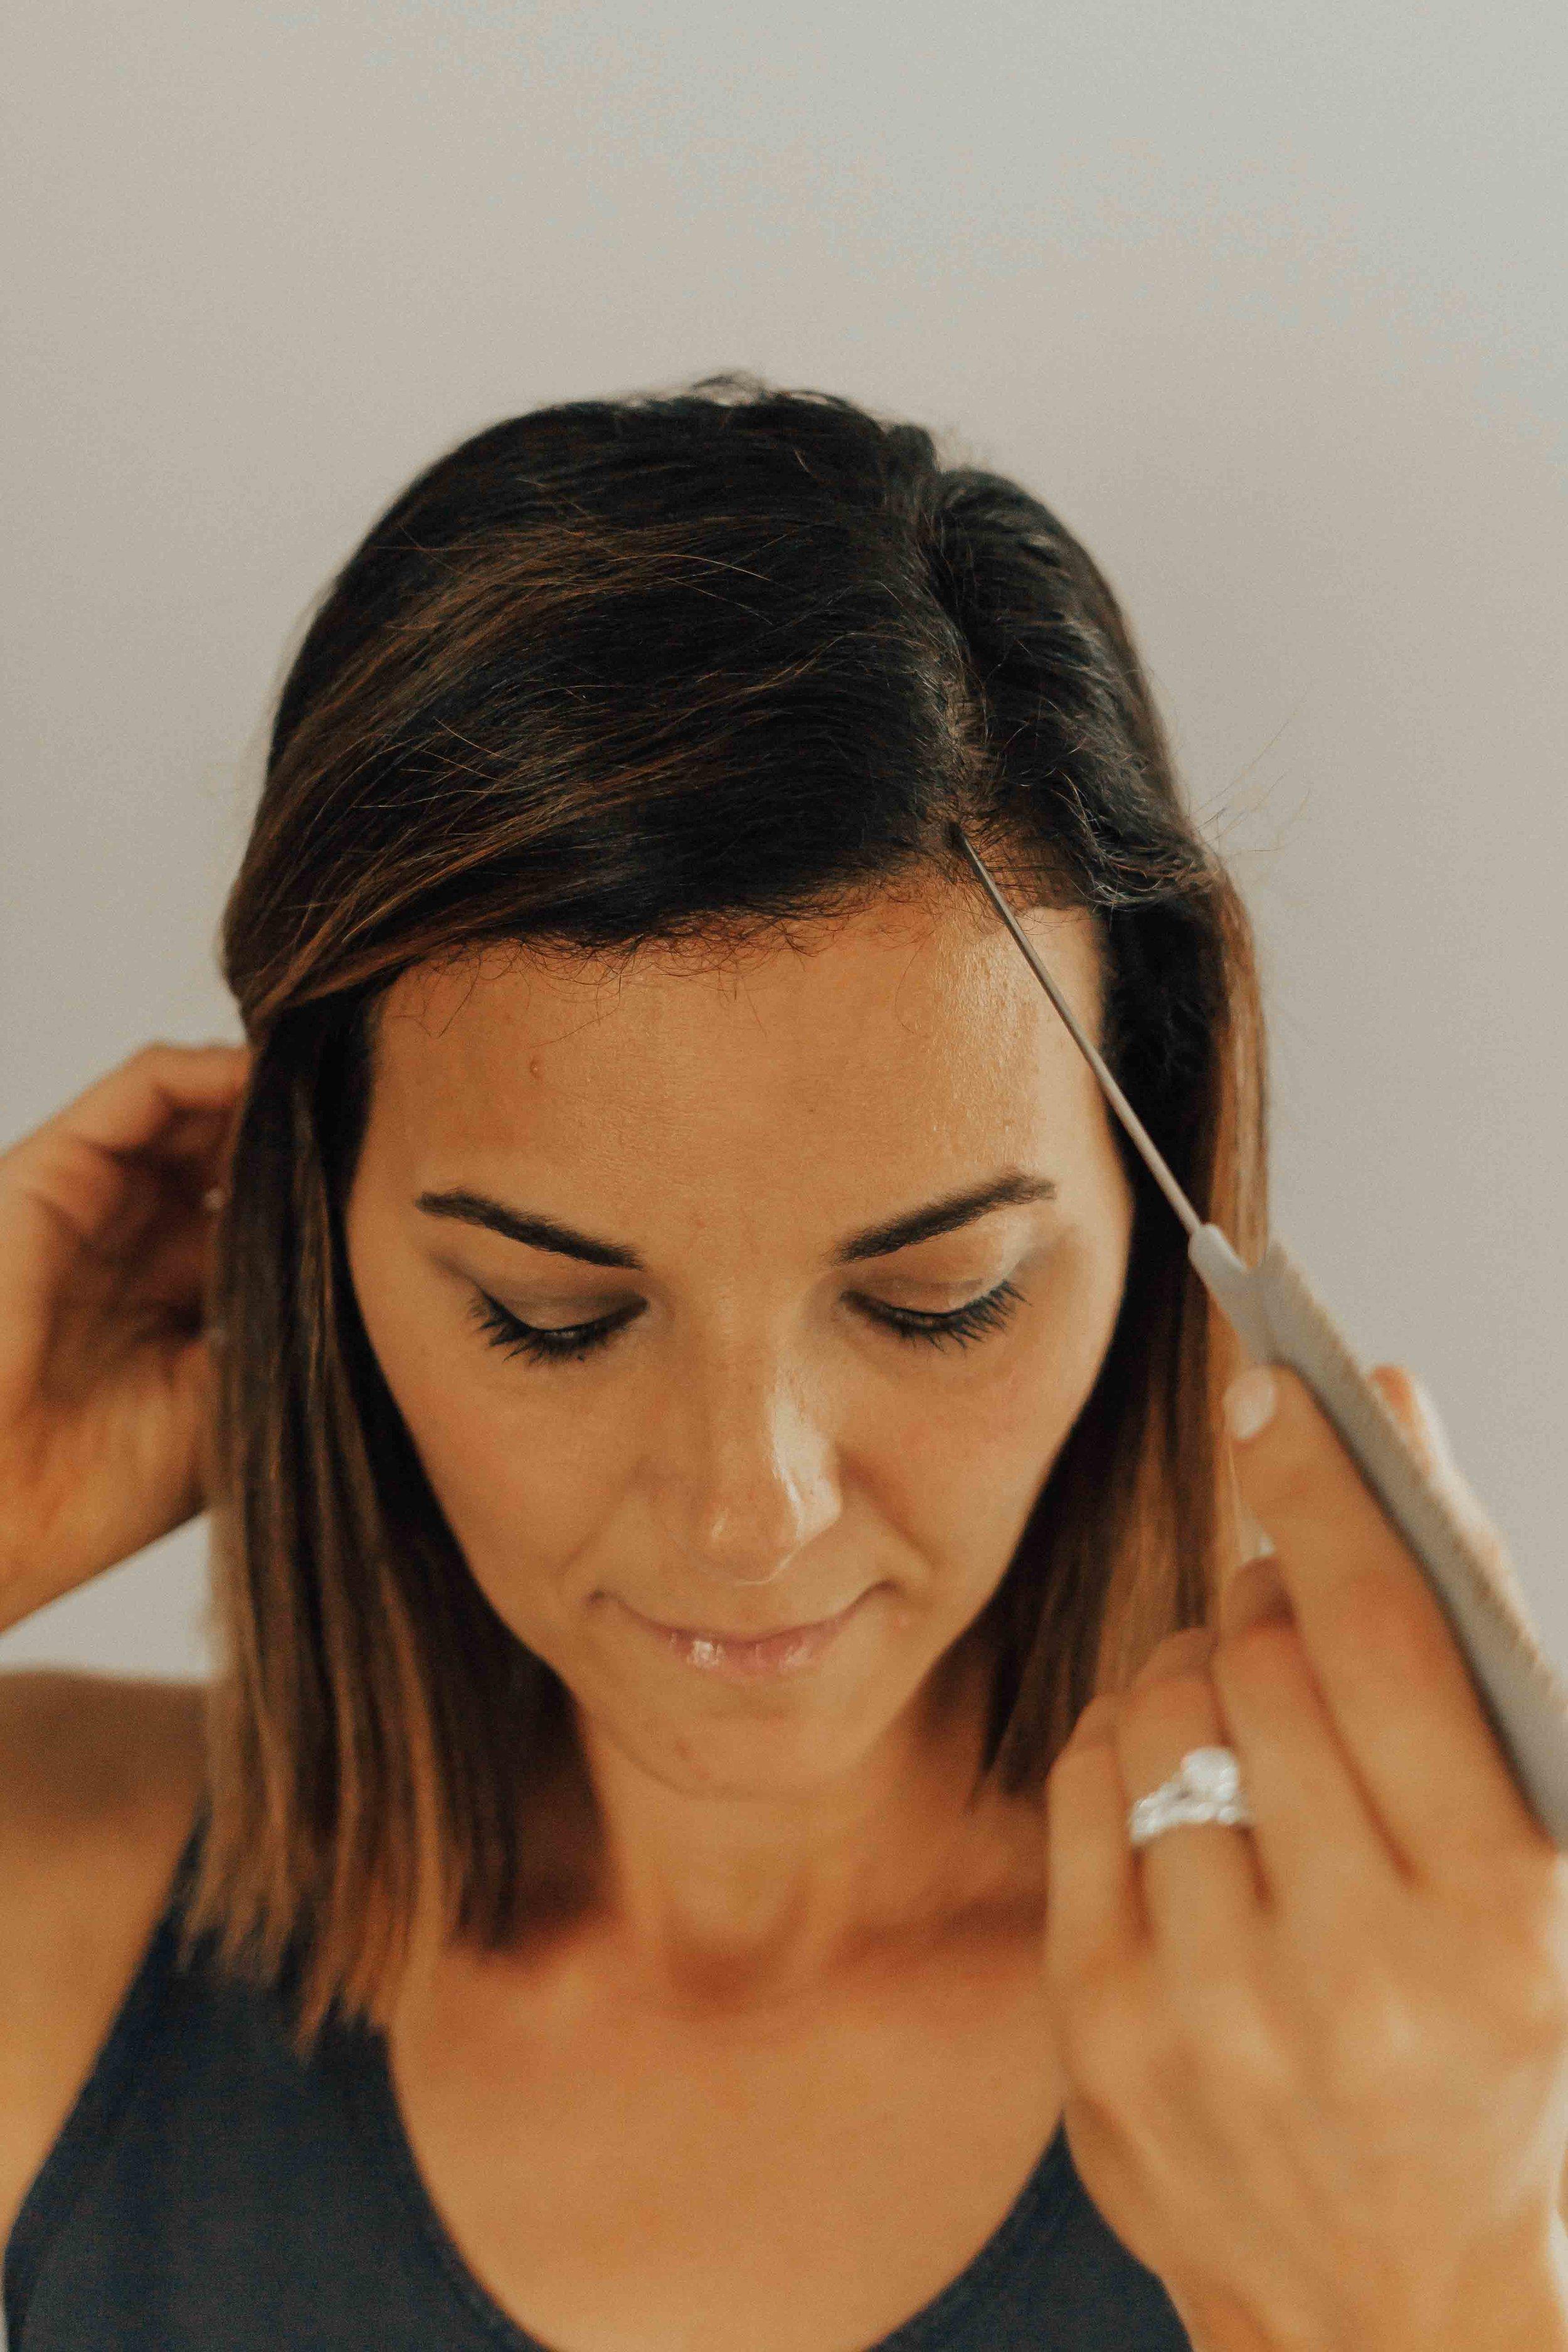 Hair Tutorial - Deep side part - Virtue Haircare - Bob Hair Tutorial -  www.heartandseam.com  #heartandseam